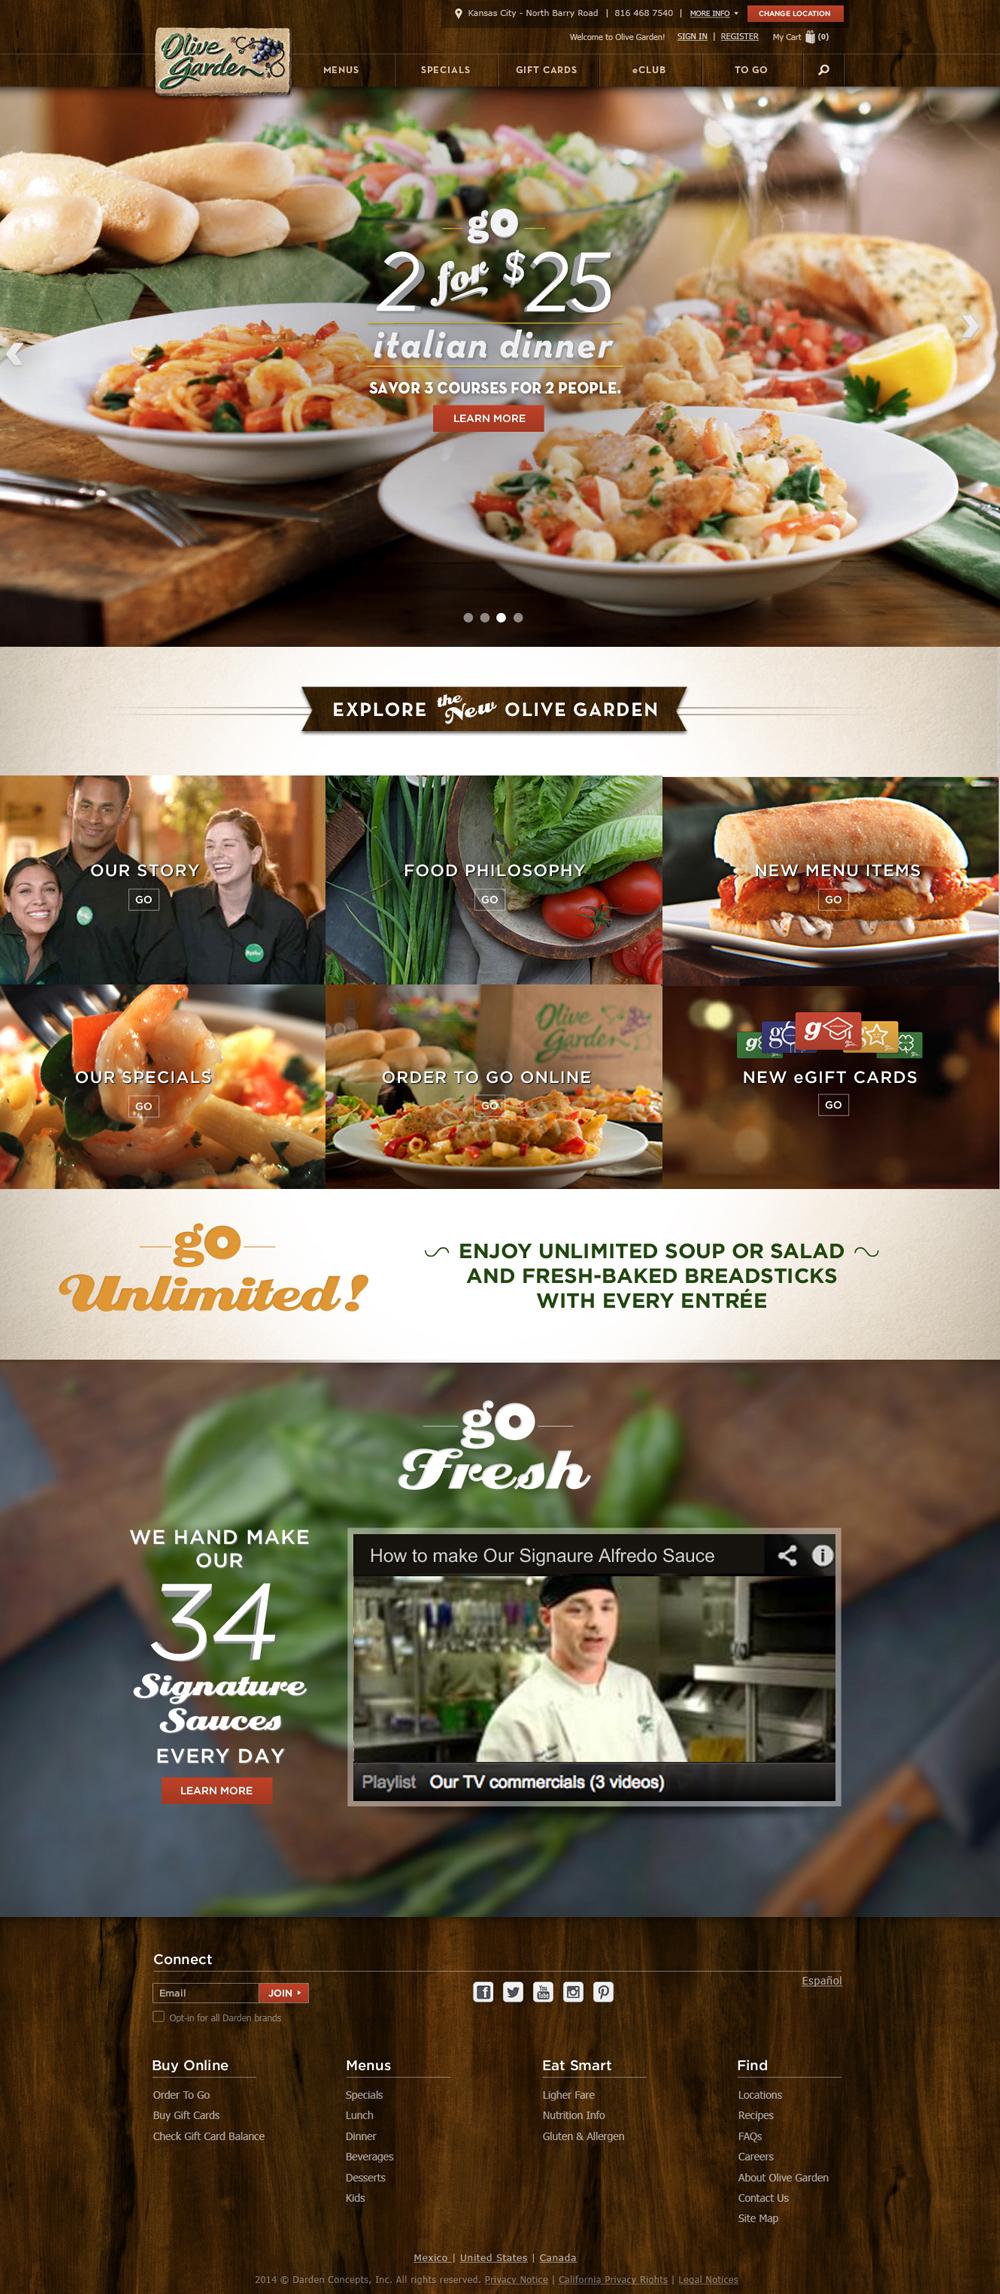 chrisdegnen.com » Olive Garden / Digital Platform